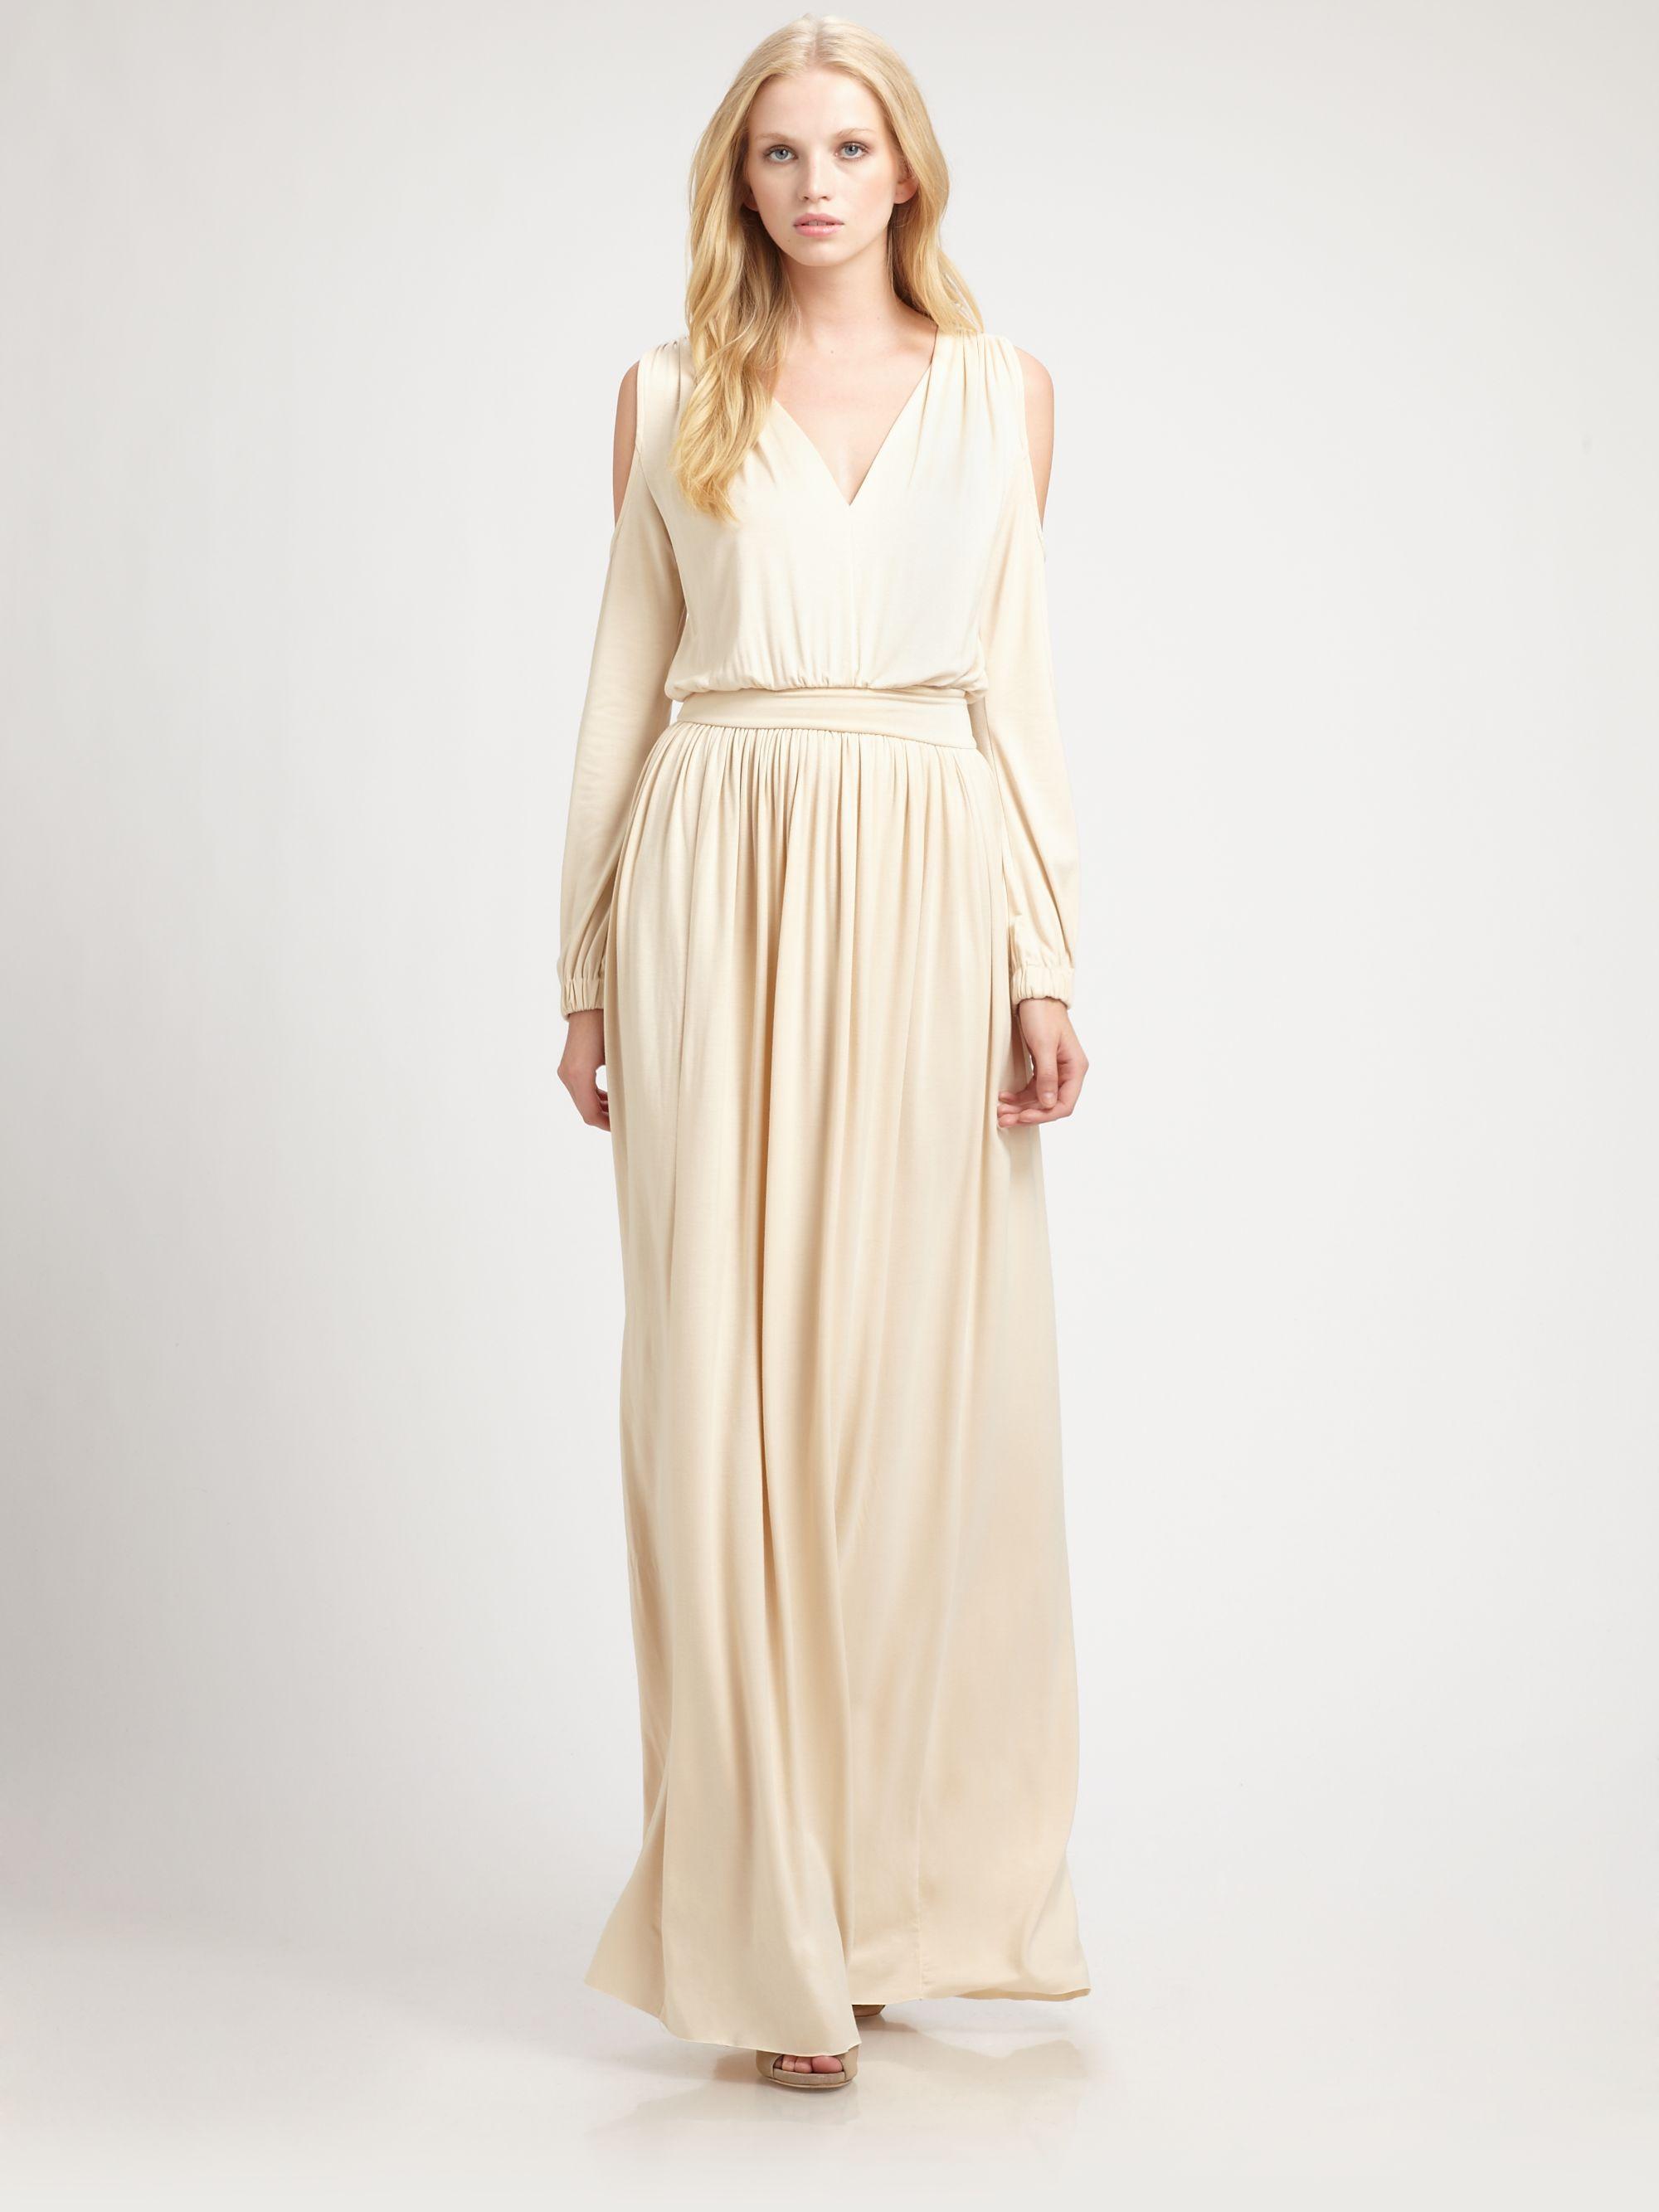 long sleeve maxi dress cream « Bella Forte Glass Studio